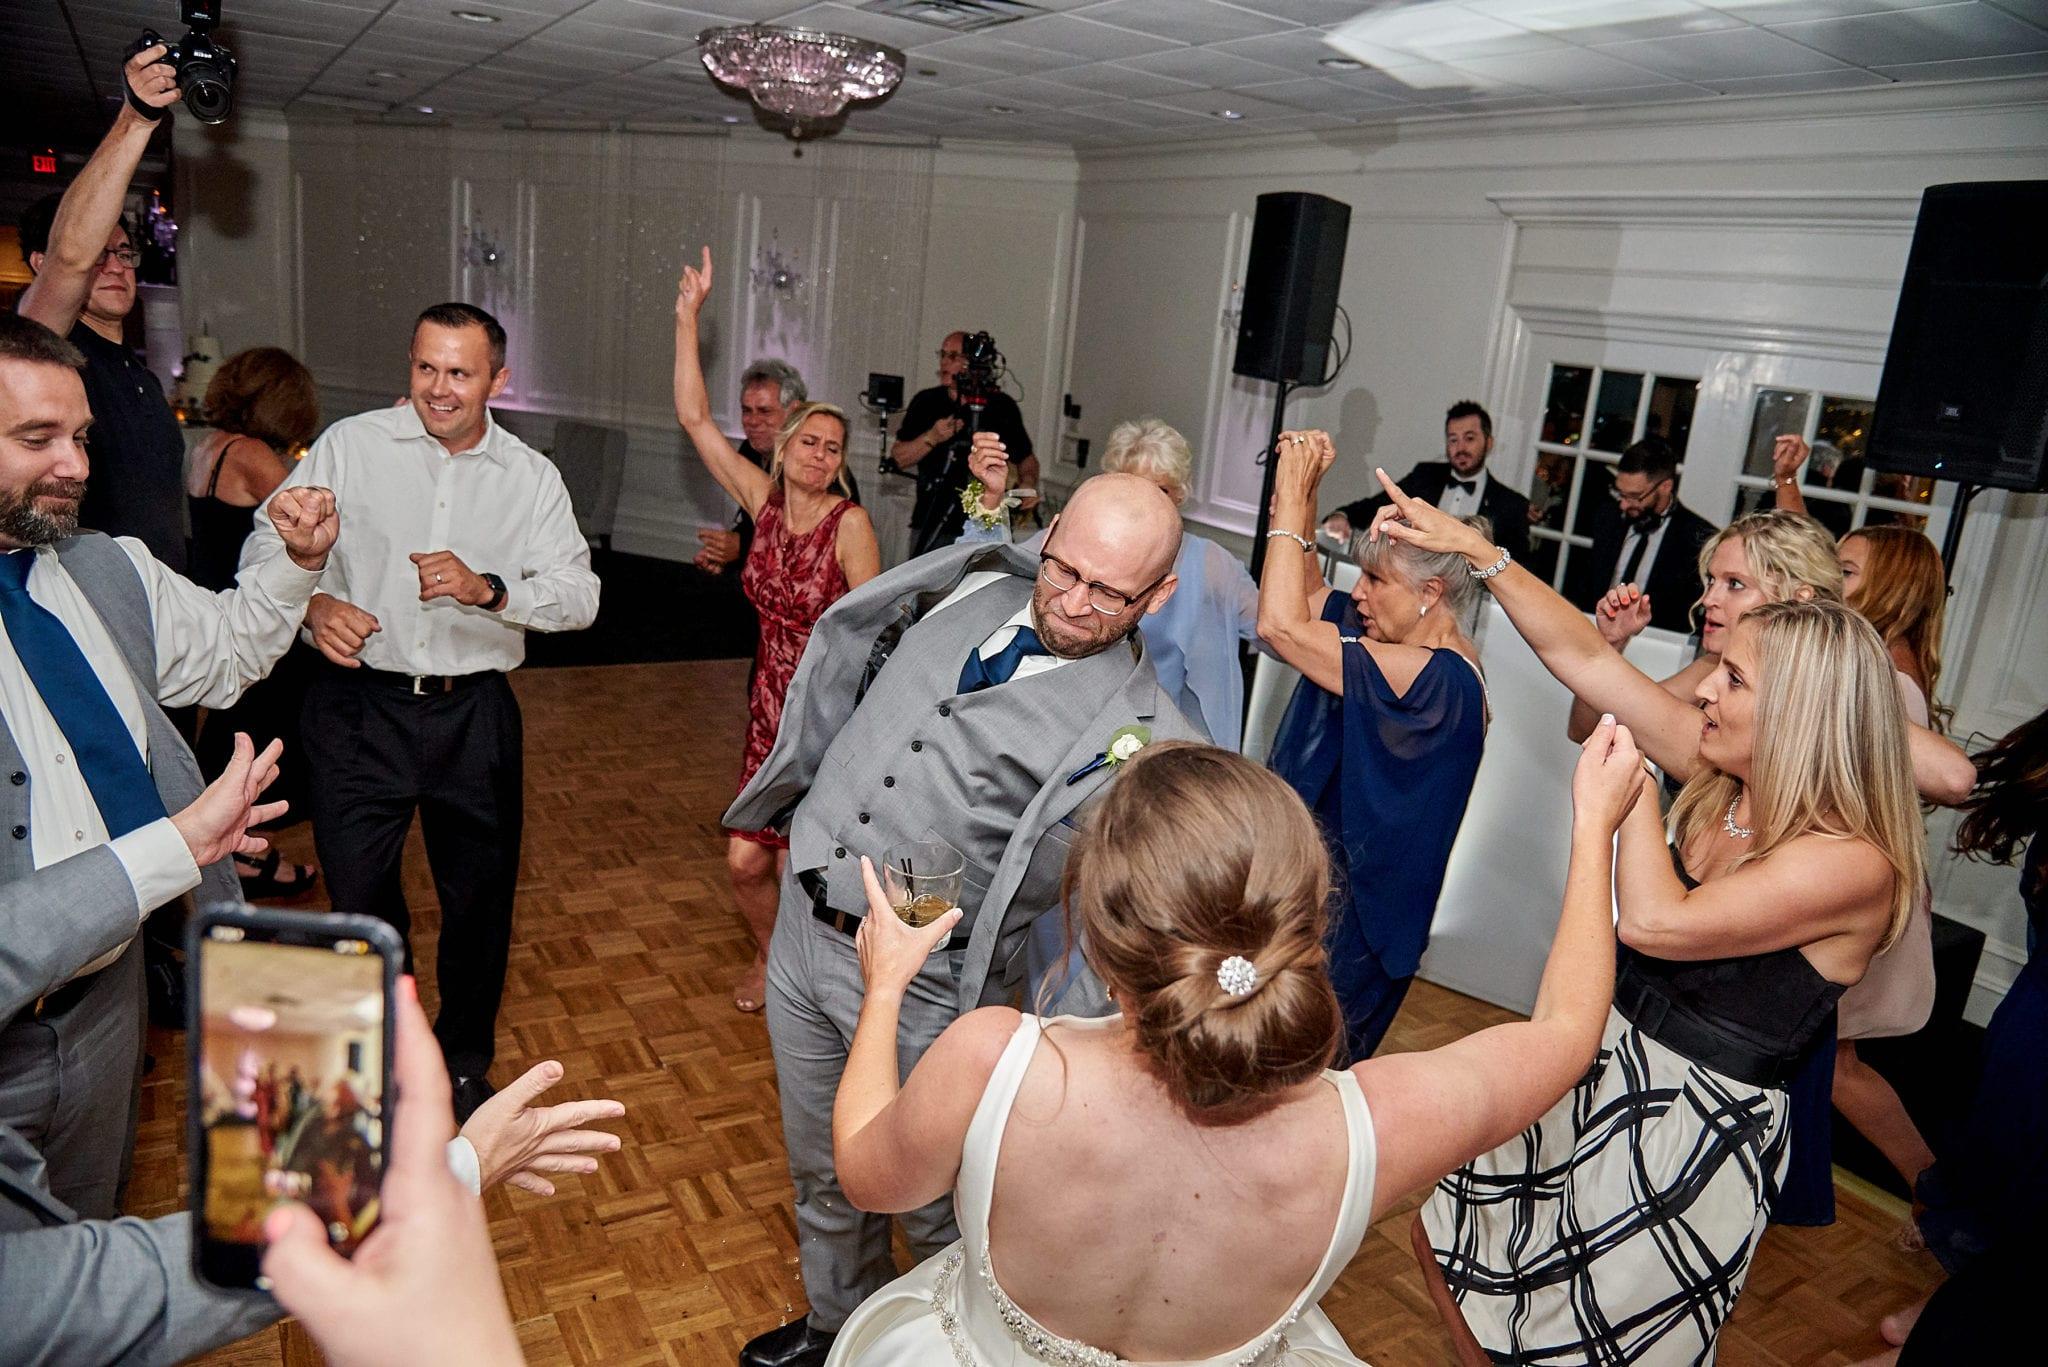 Wedding guests dancing at a reception.